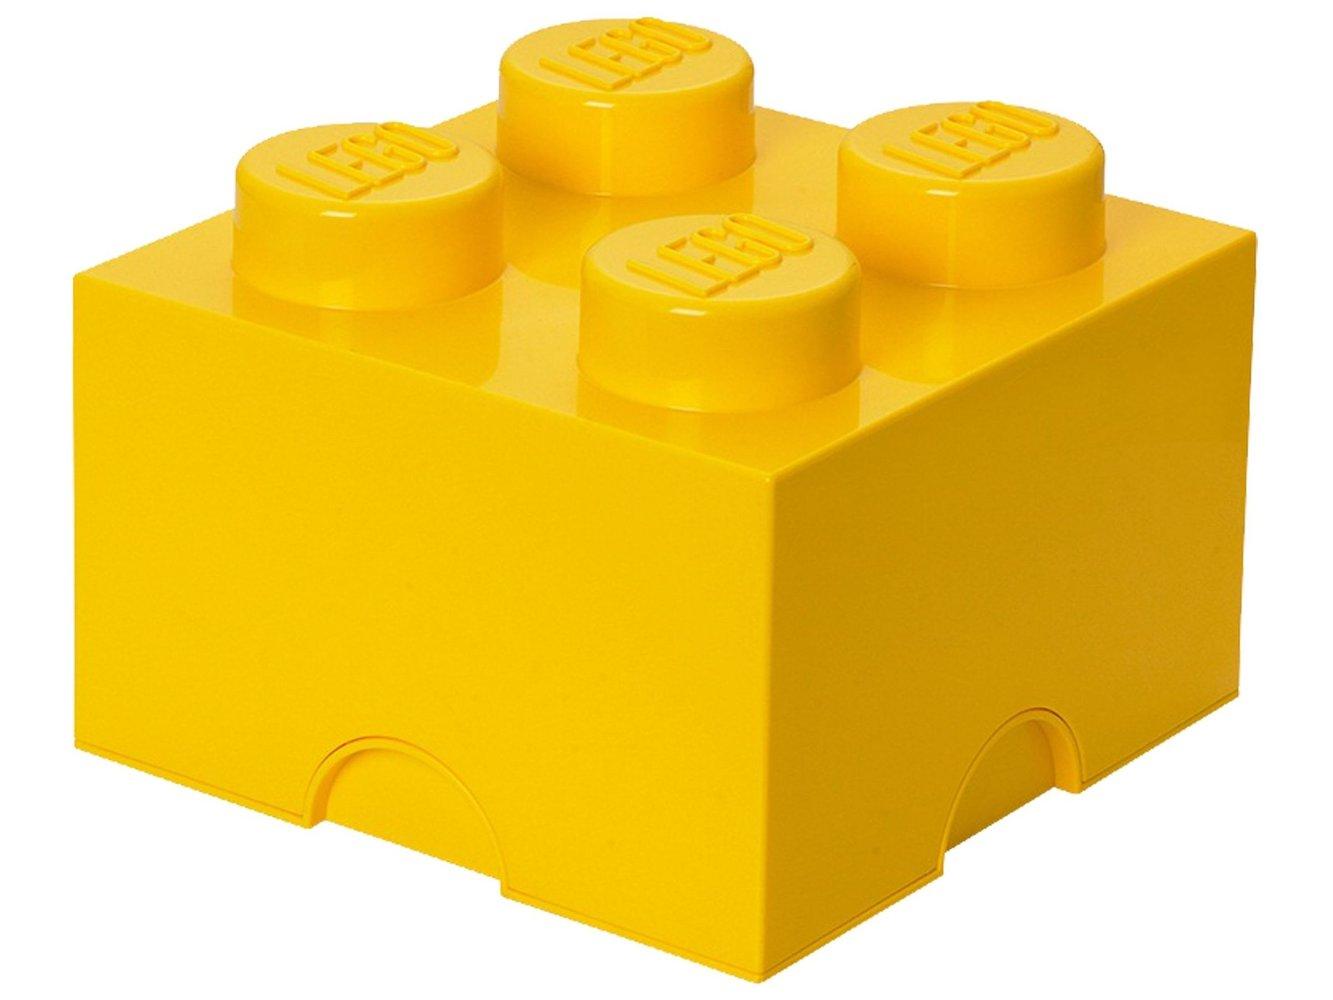 4 stud Yellow Storage Brick